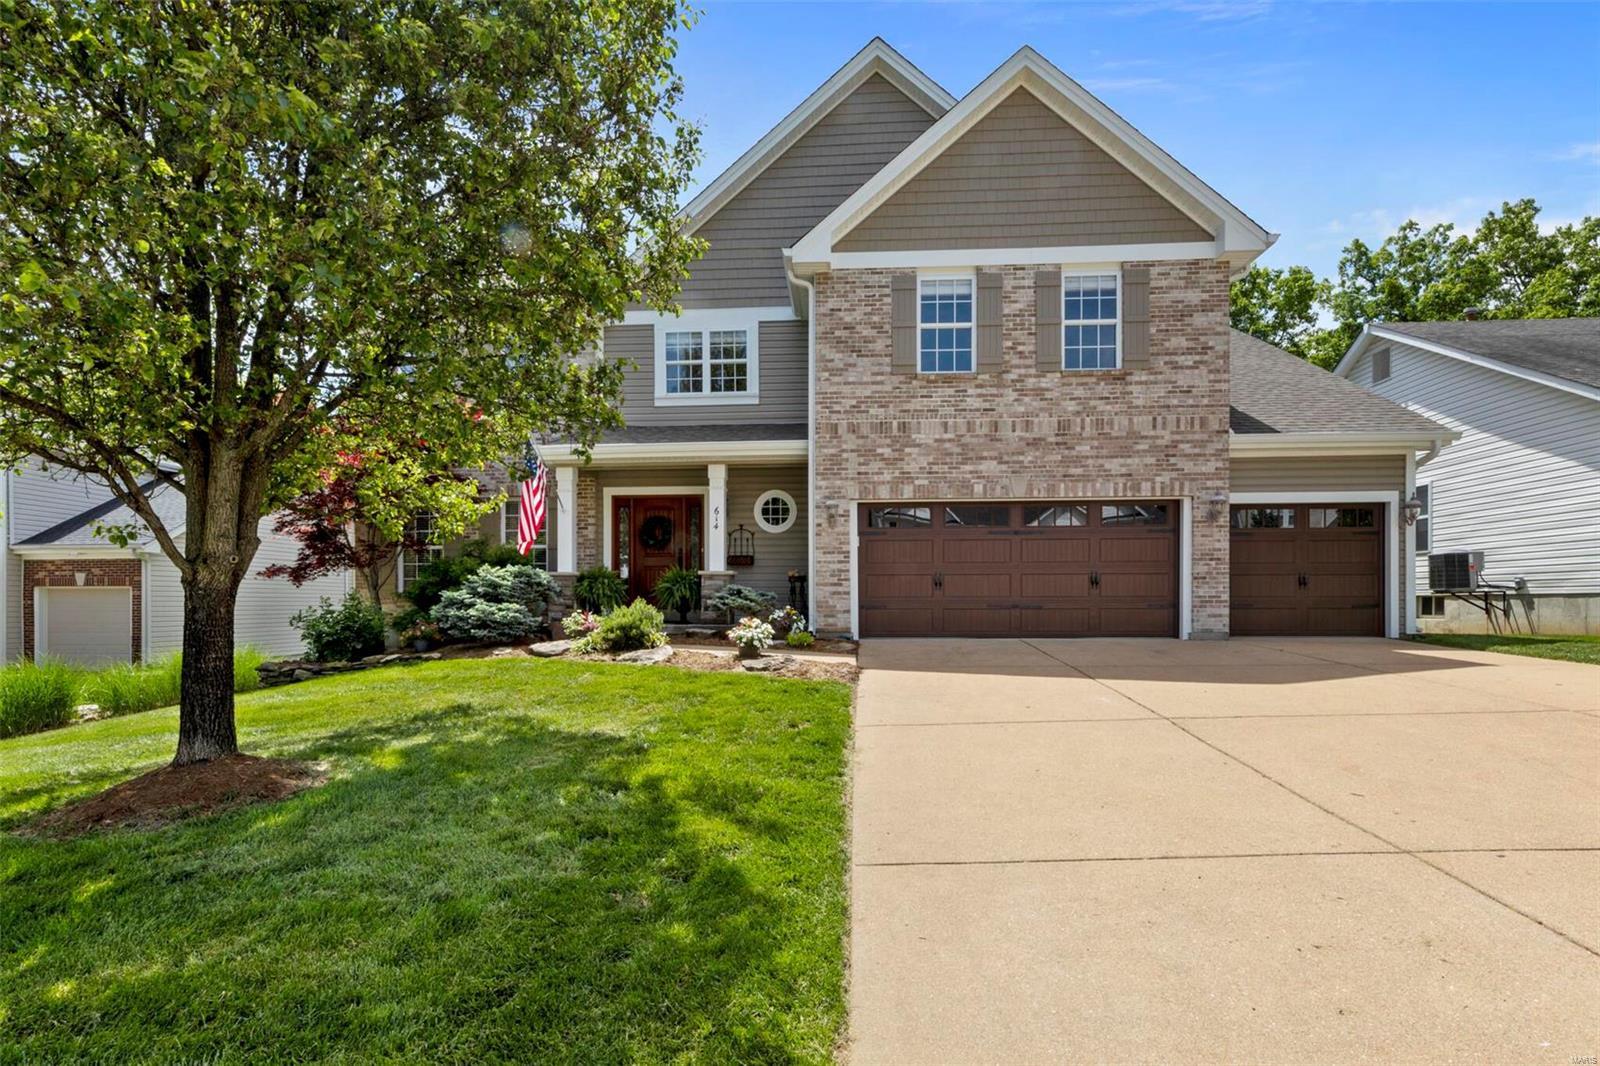 614 Legends Bluffs Property Photo - Eureka, MO real estate listing